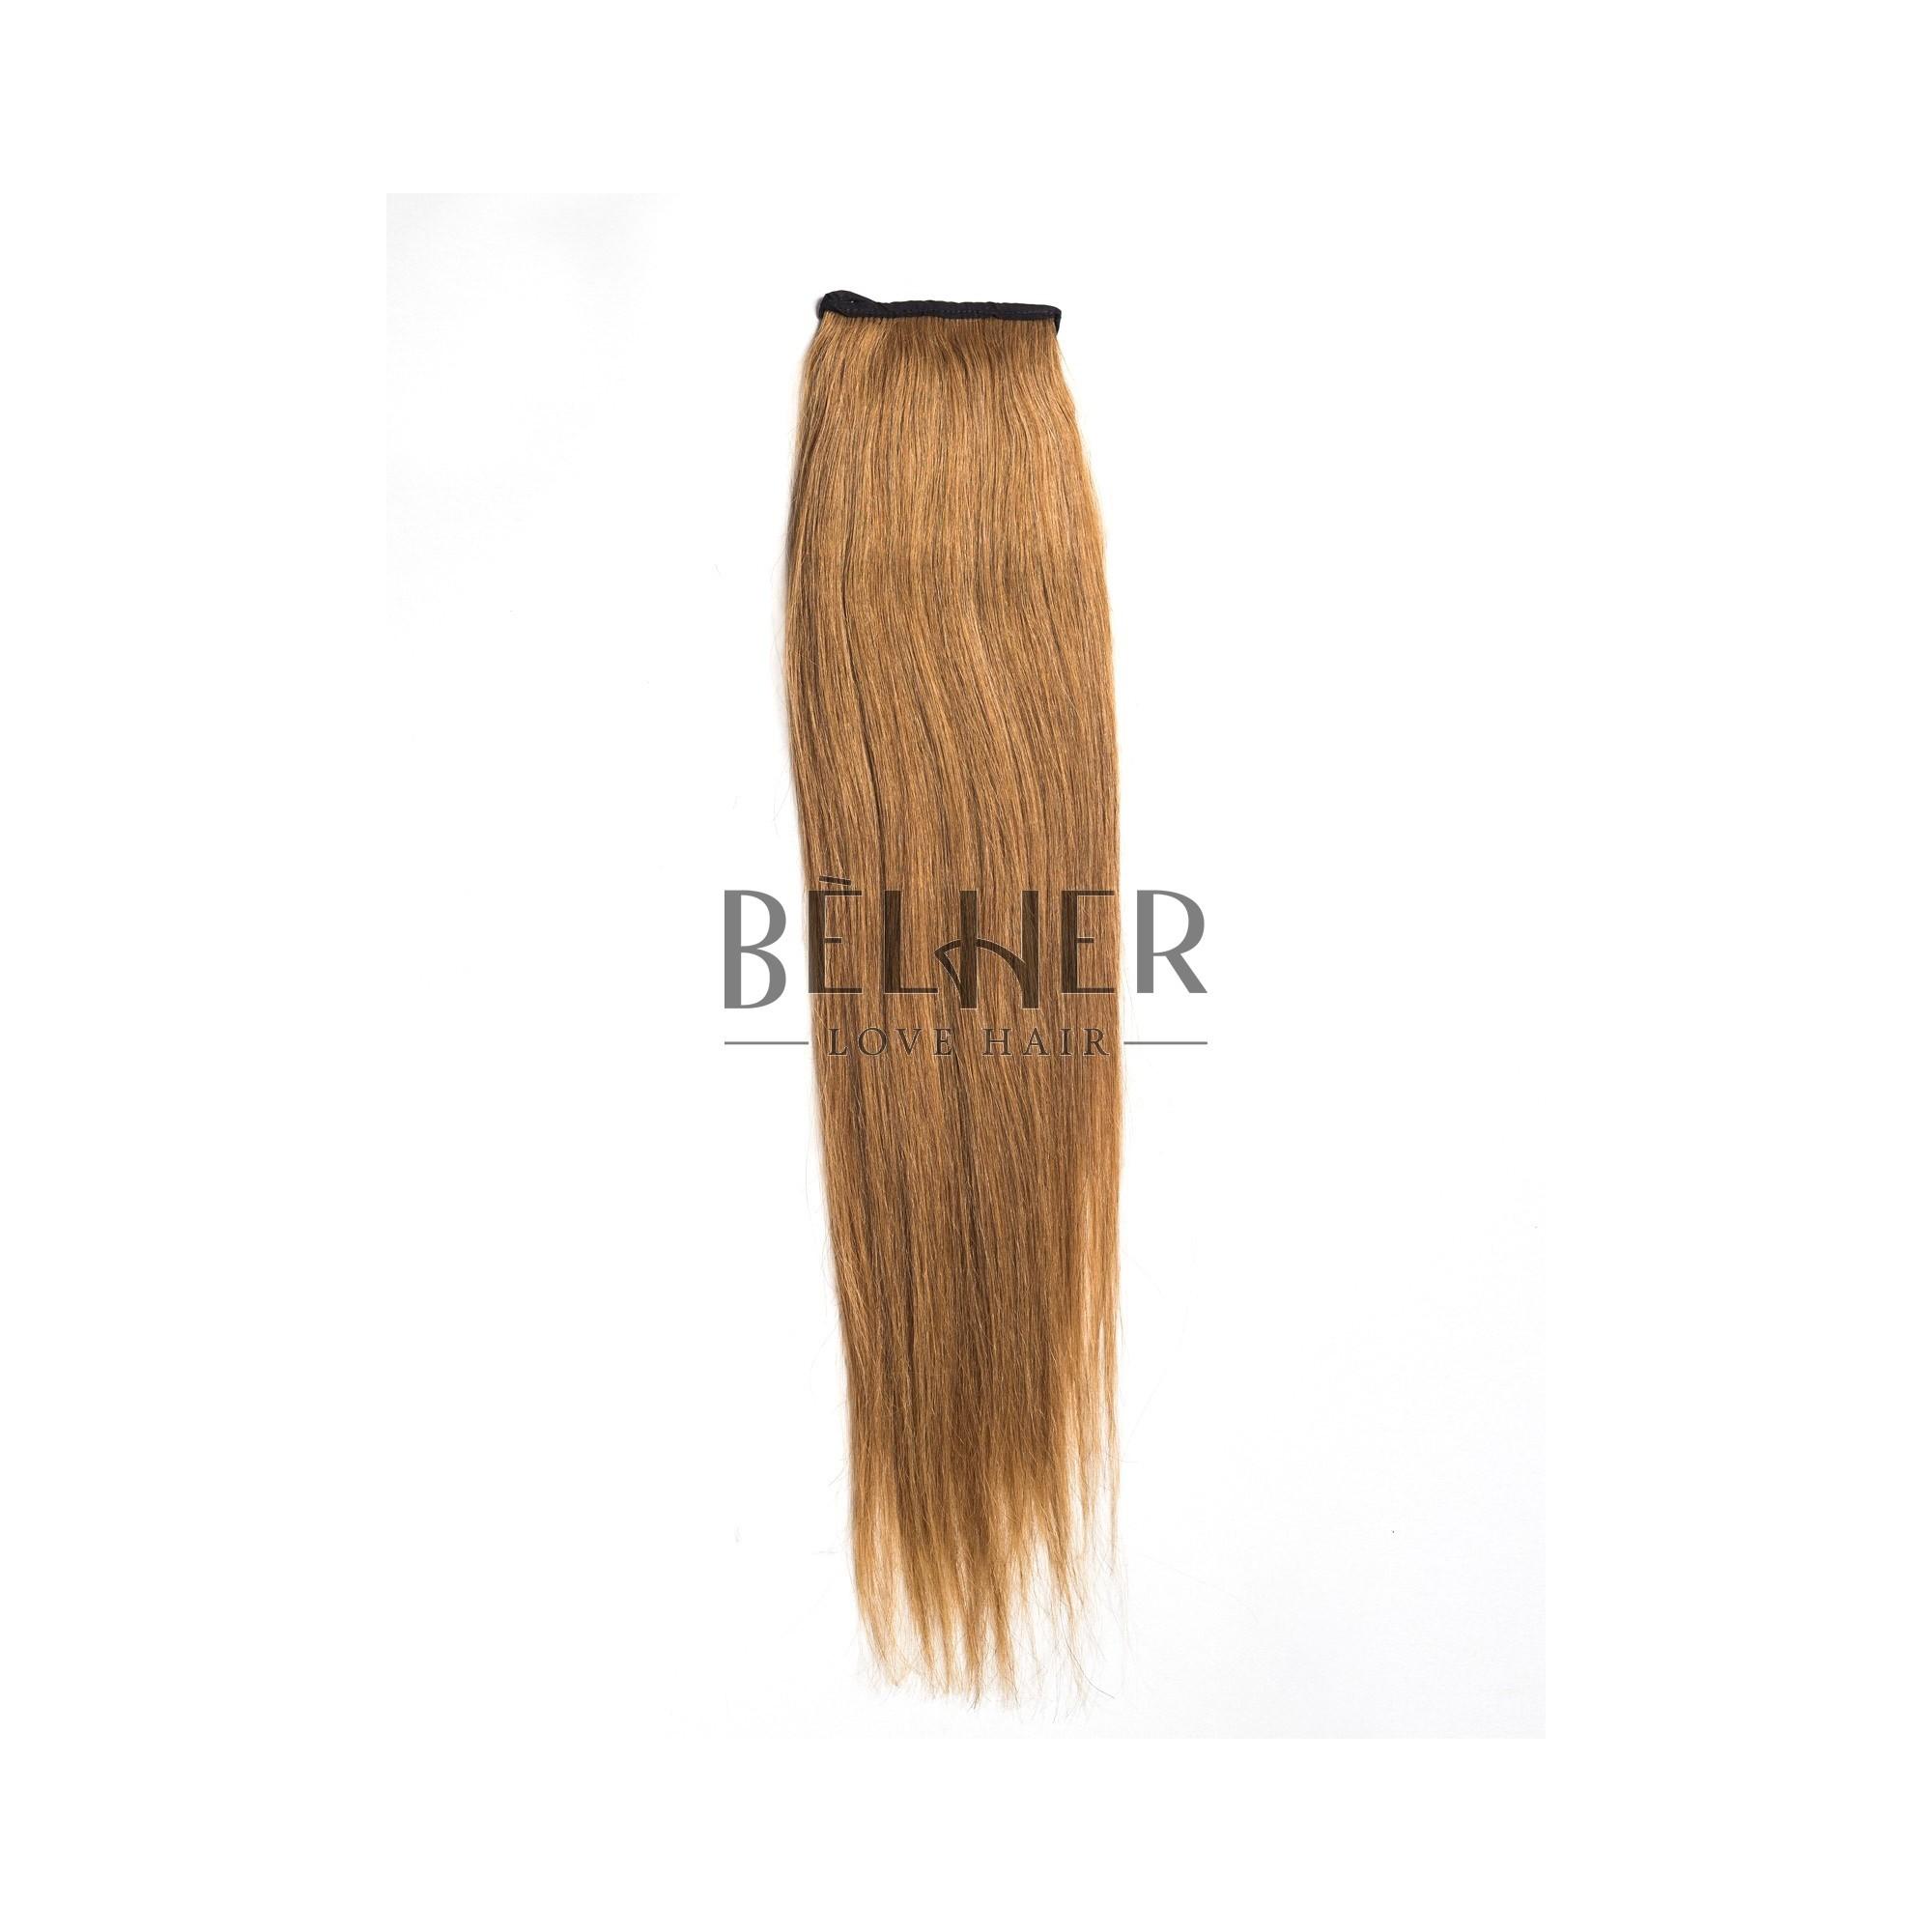 Coada Premium Mix Blond